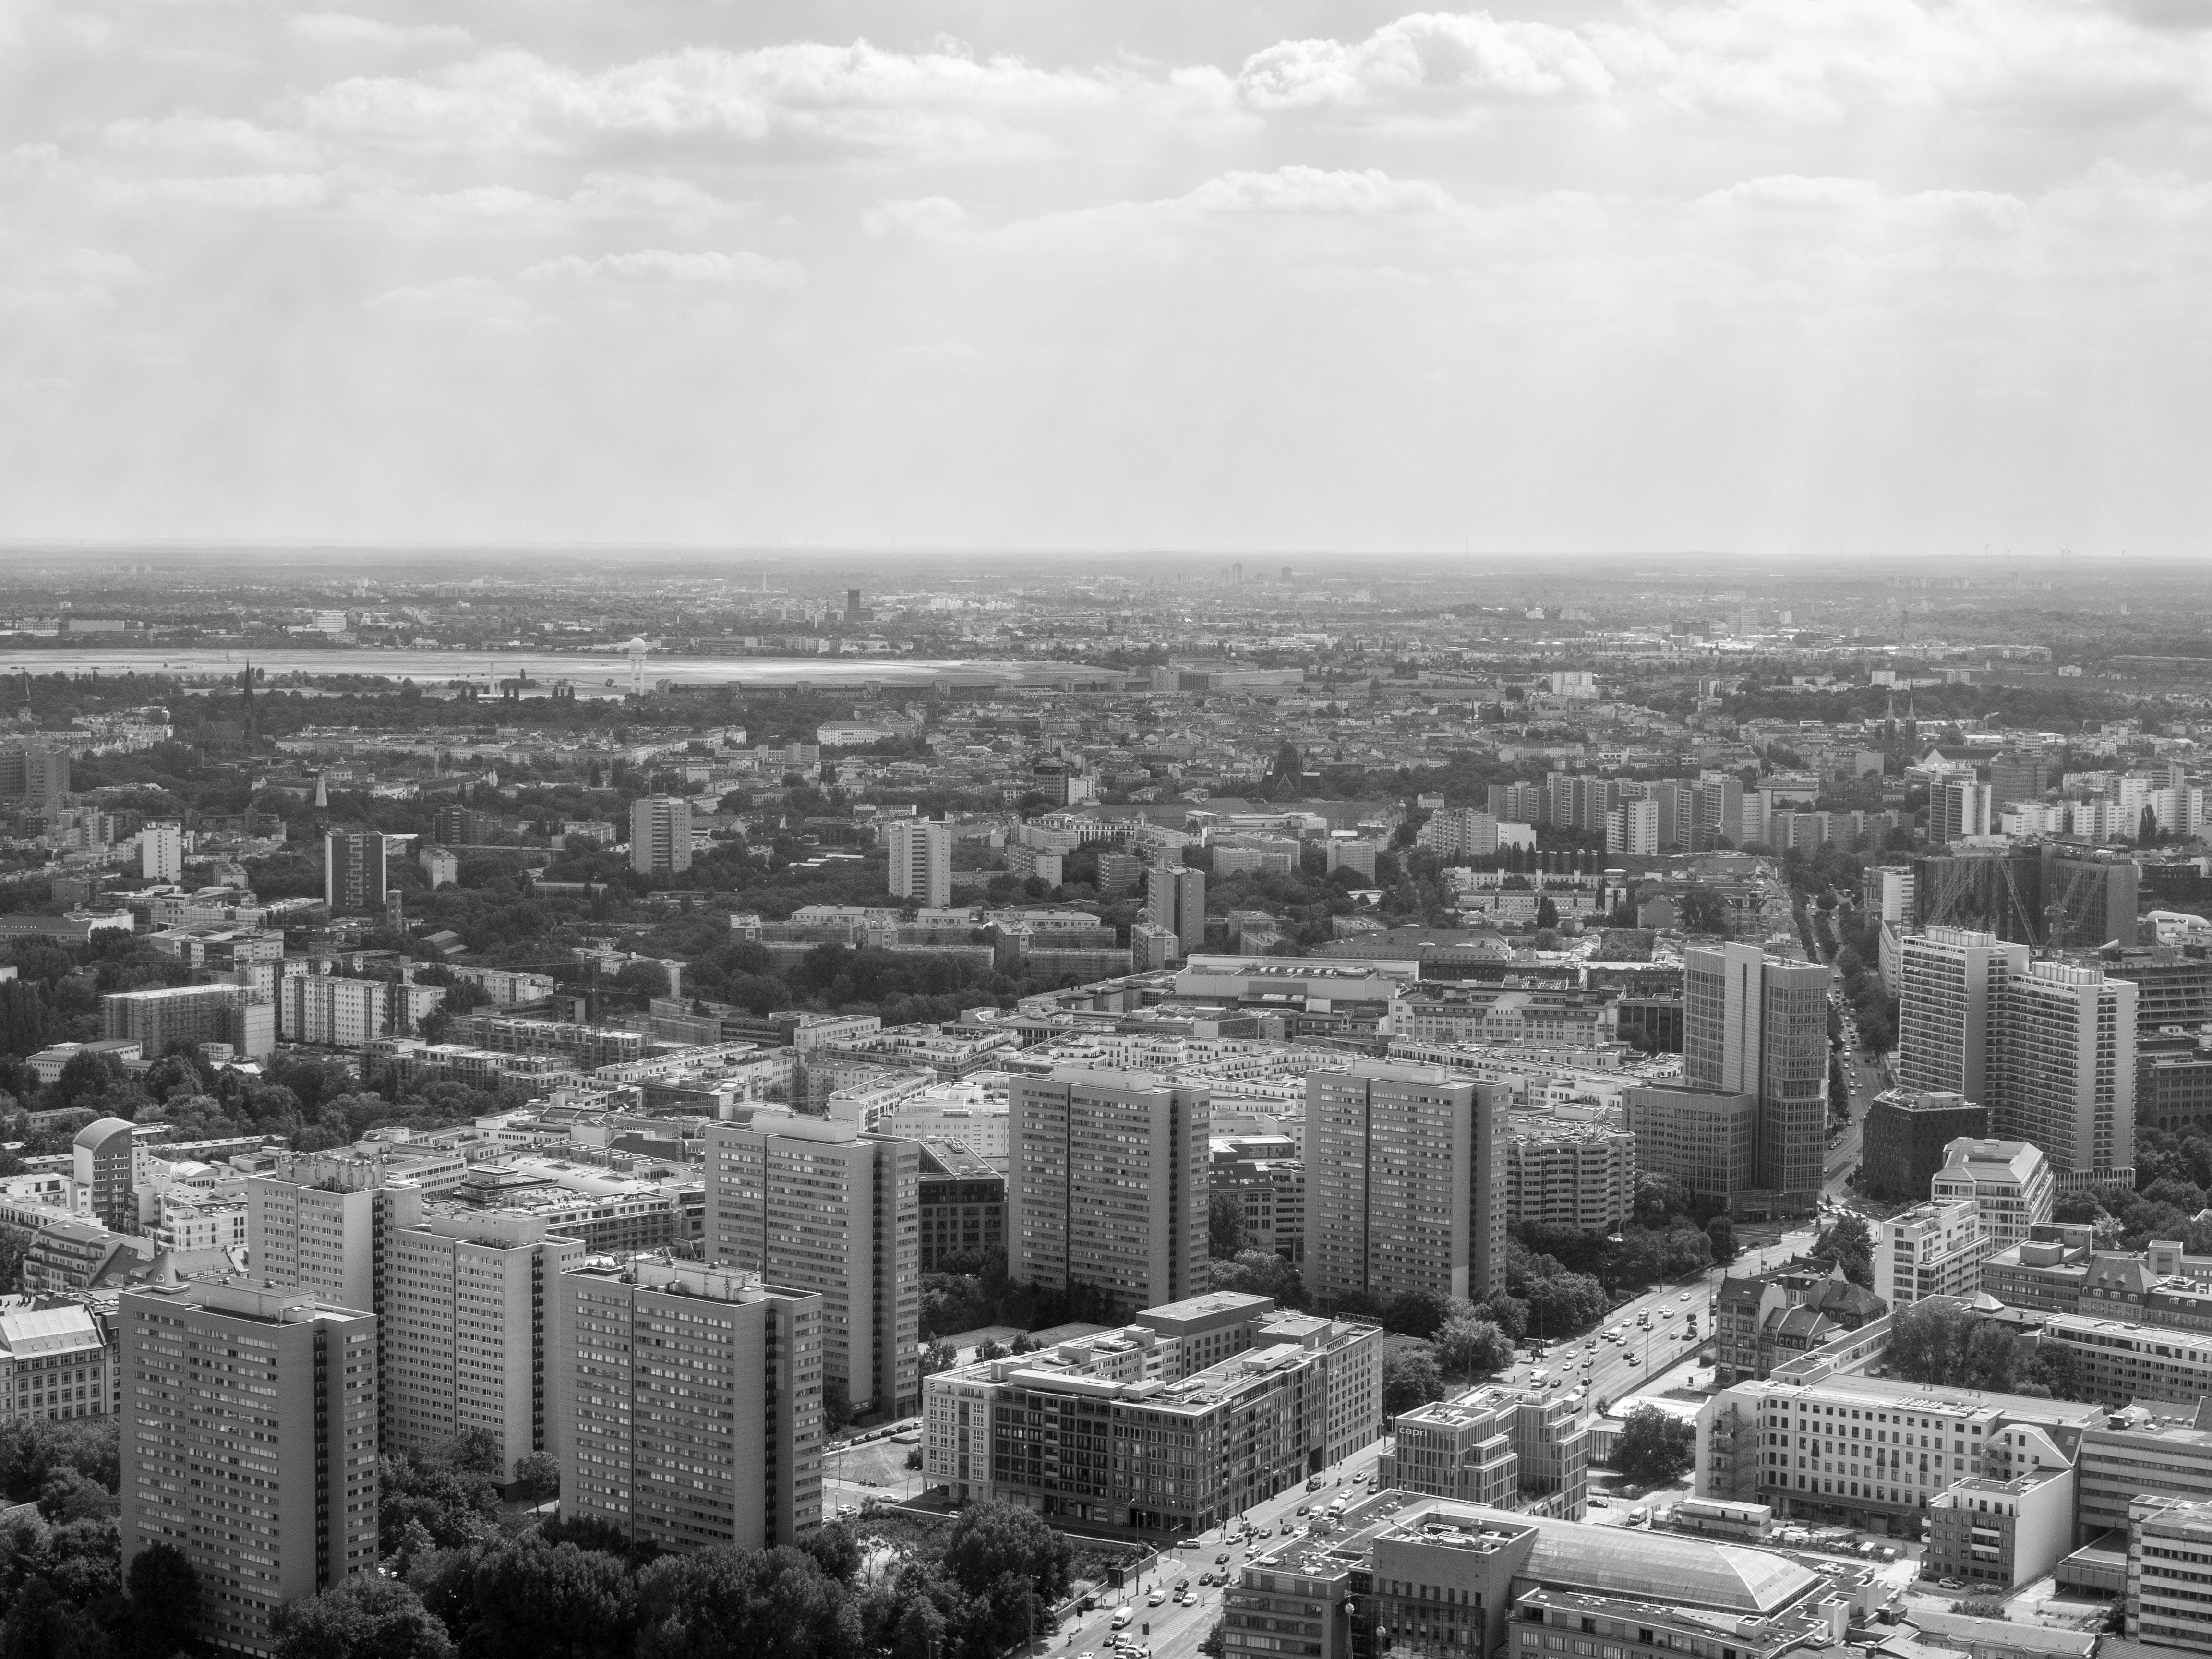 Photos gratuites de Alexanderplatz, berlin, noir et blanc, panorama urbain